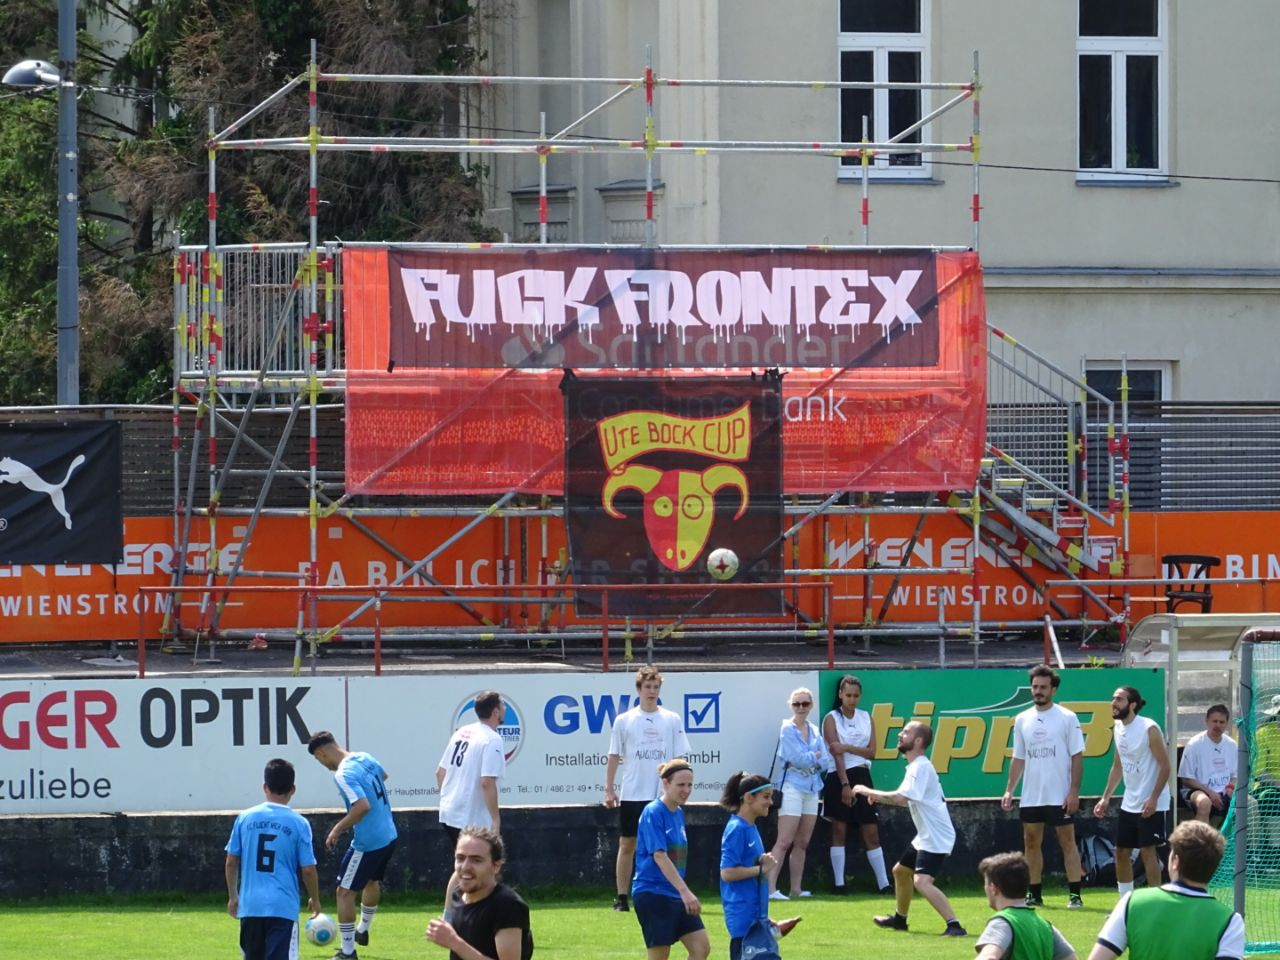 Ute Bock Cup 2019